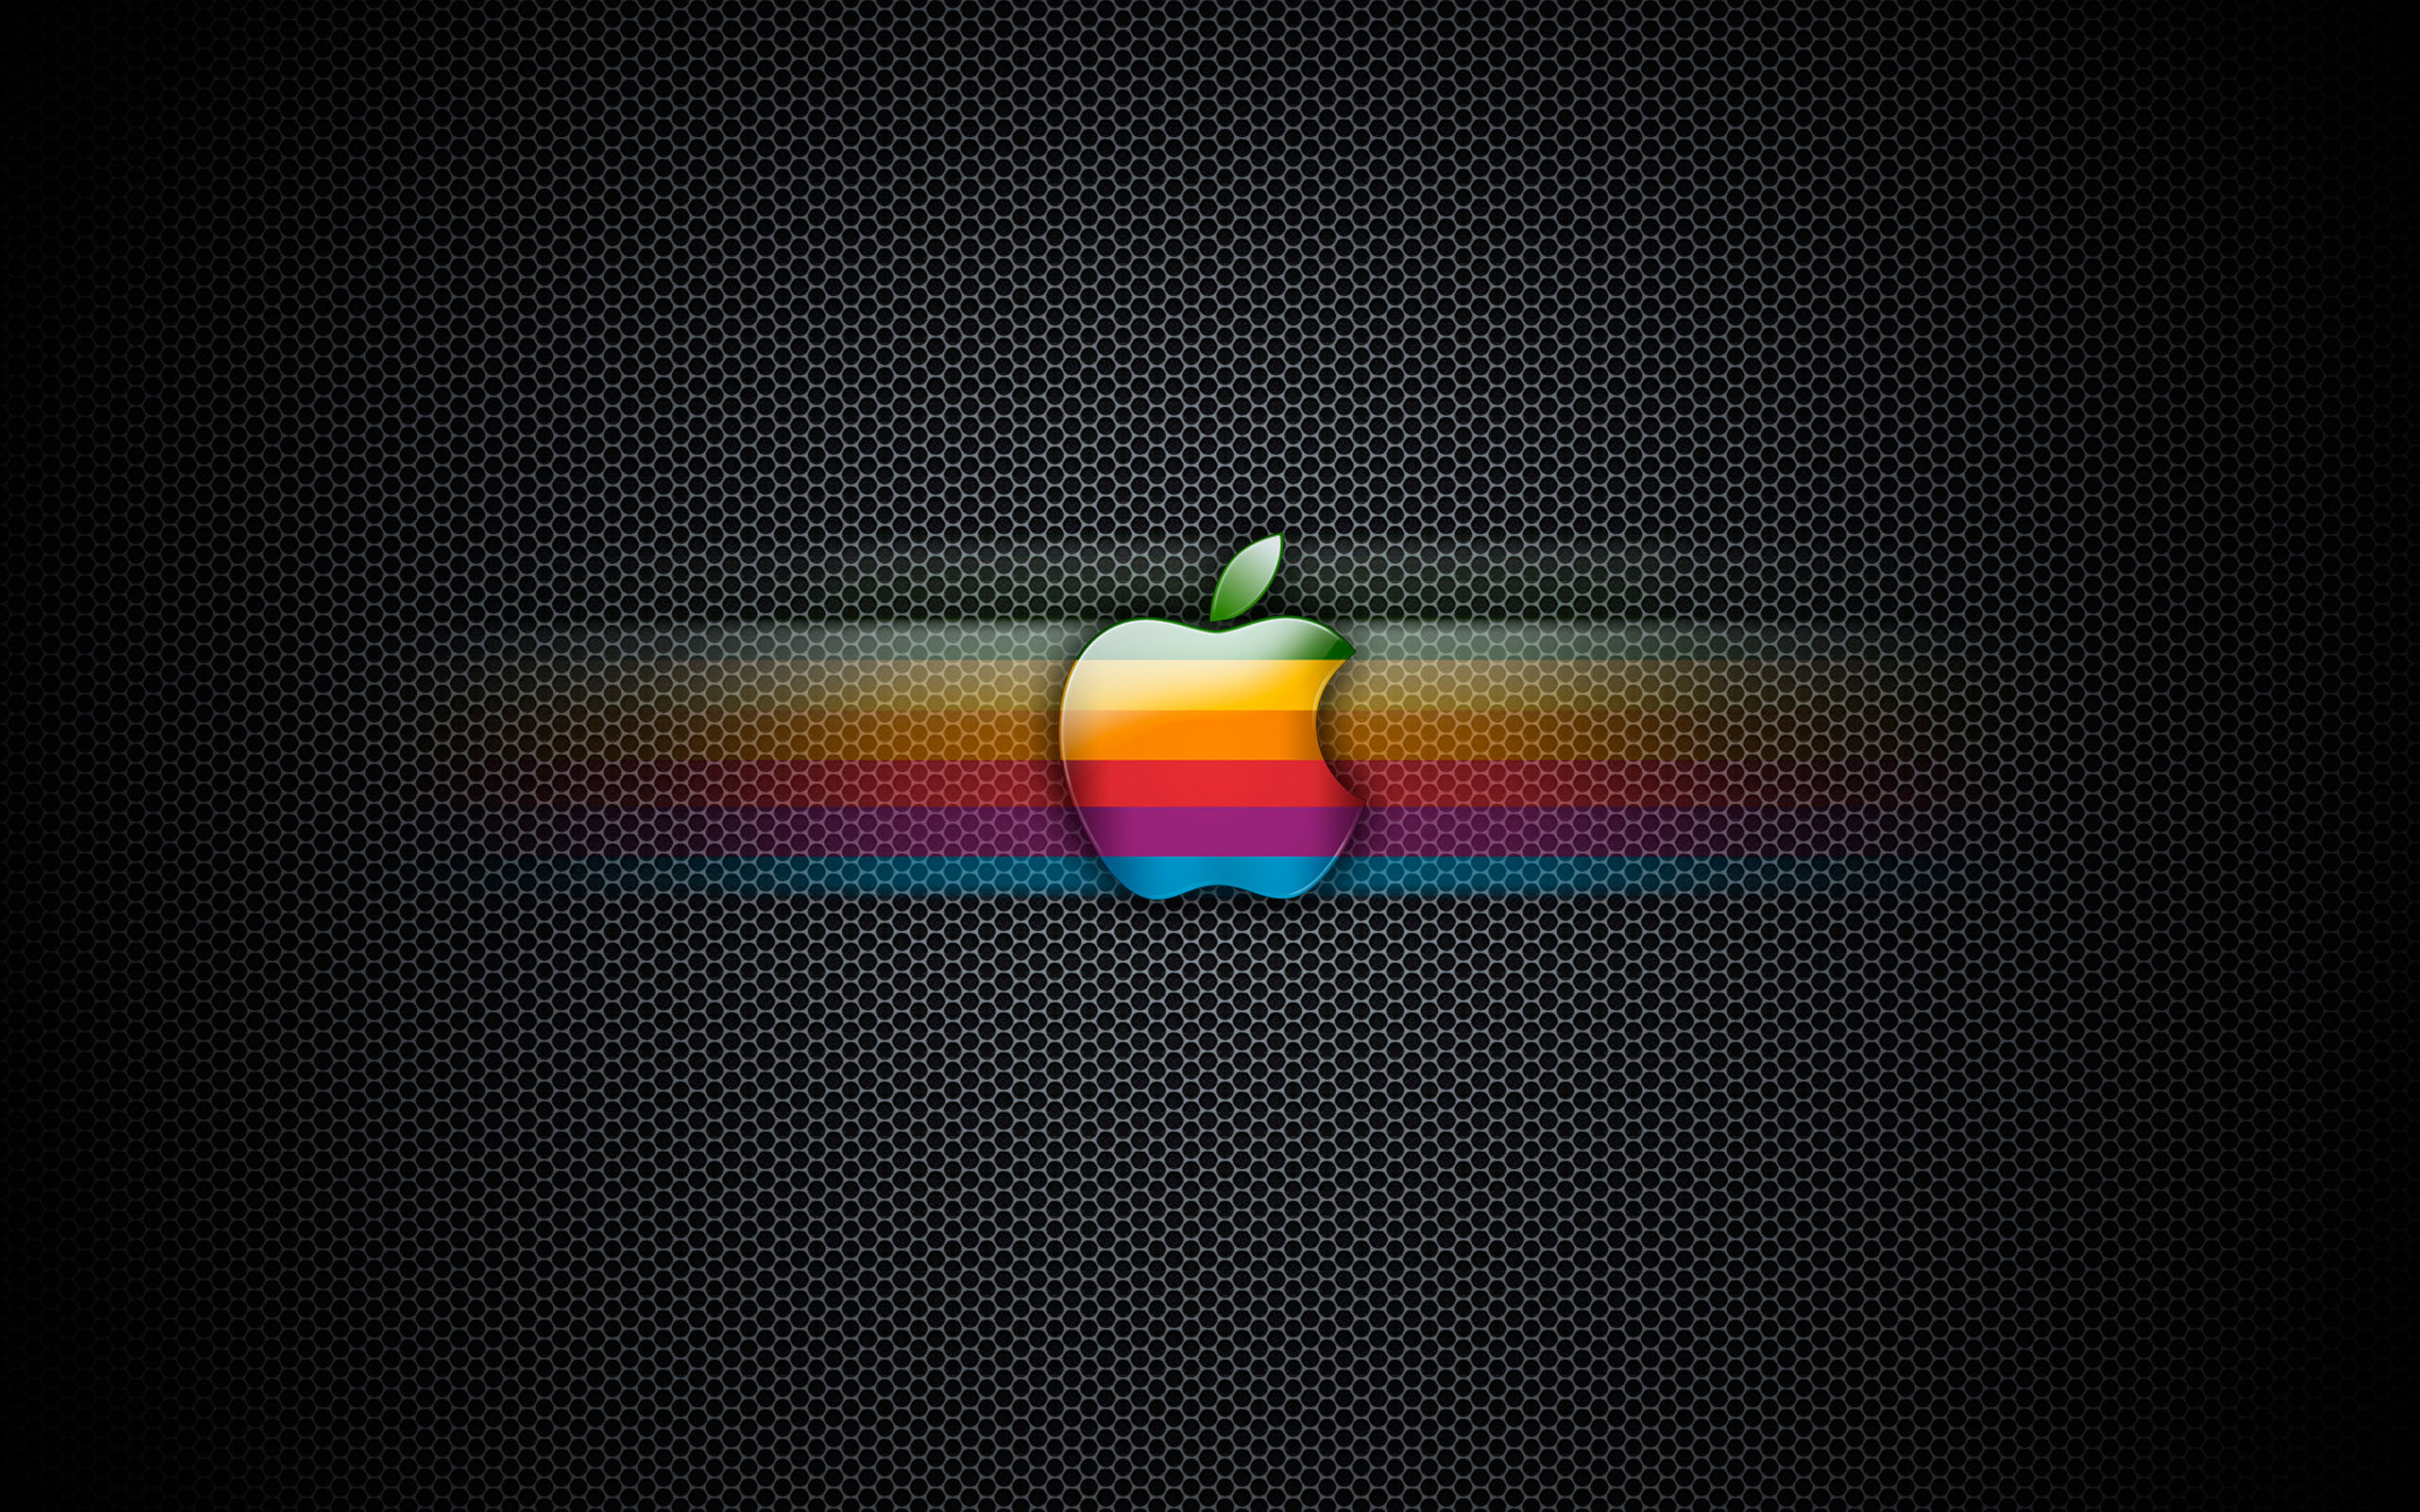 Best MacBook Wallpapers - WallpaperSafari